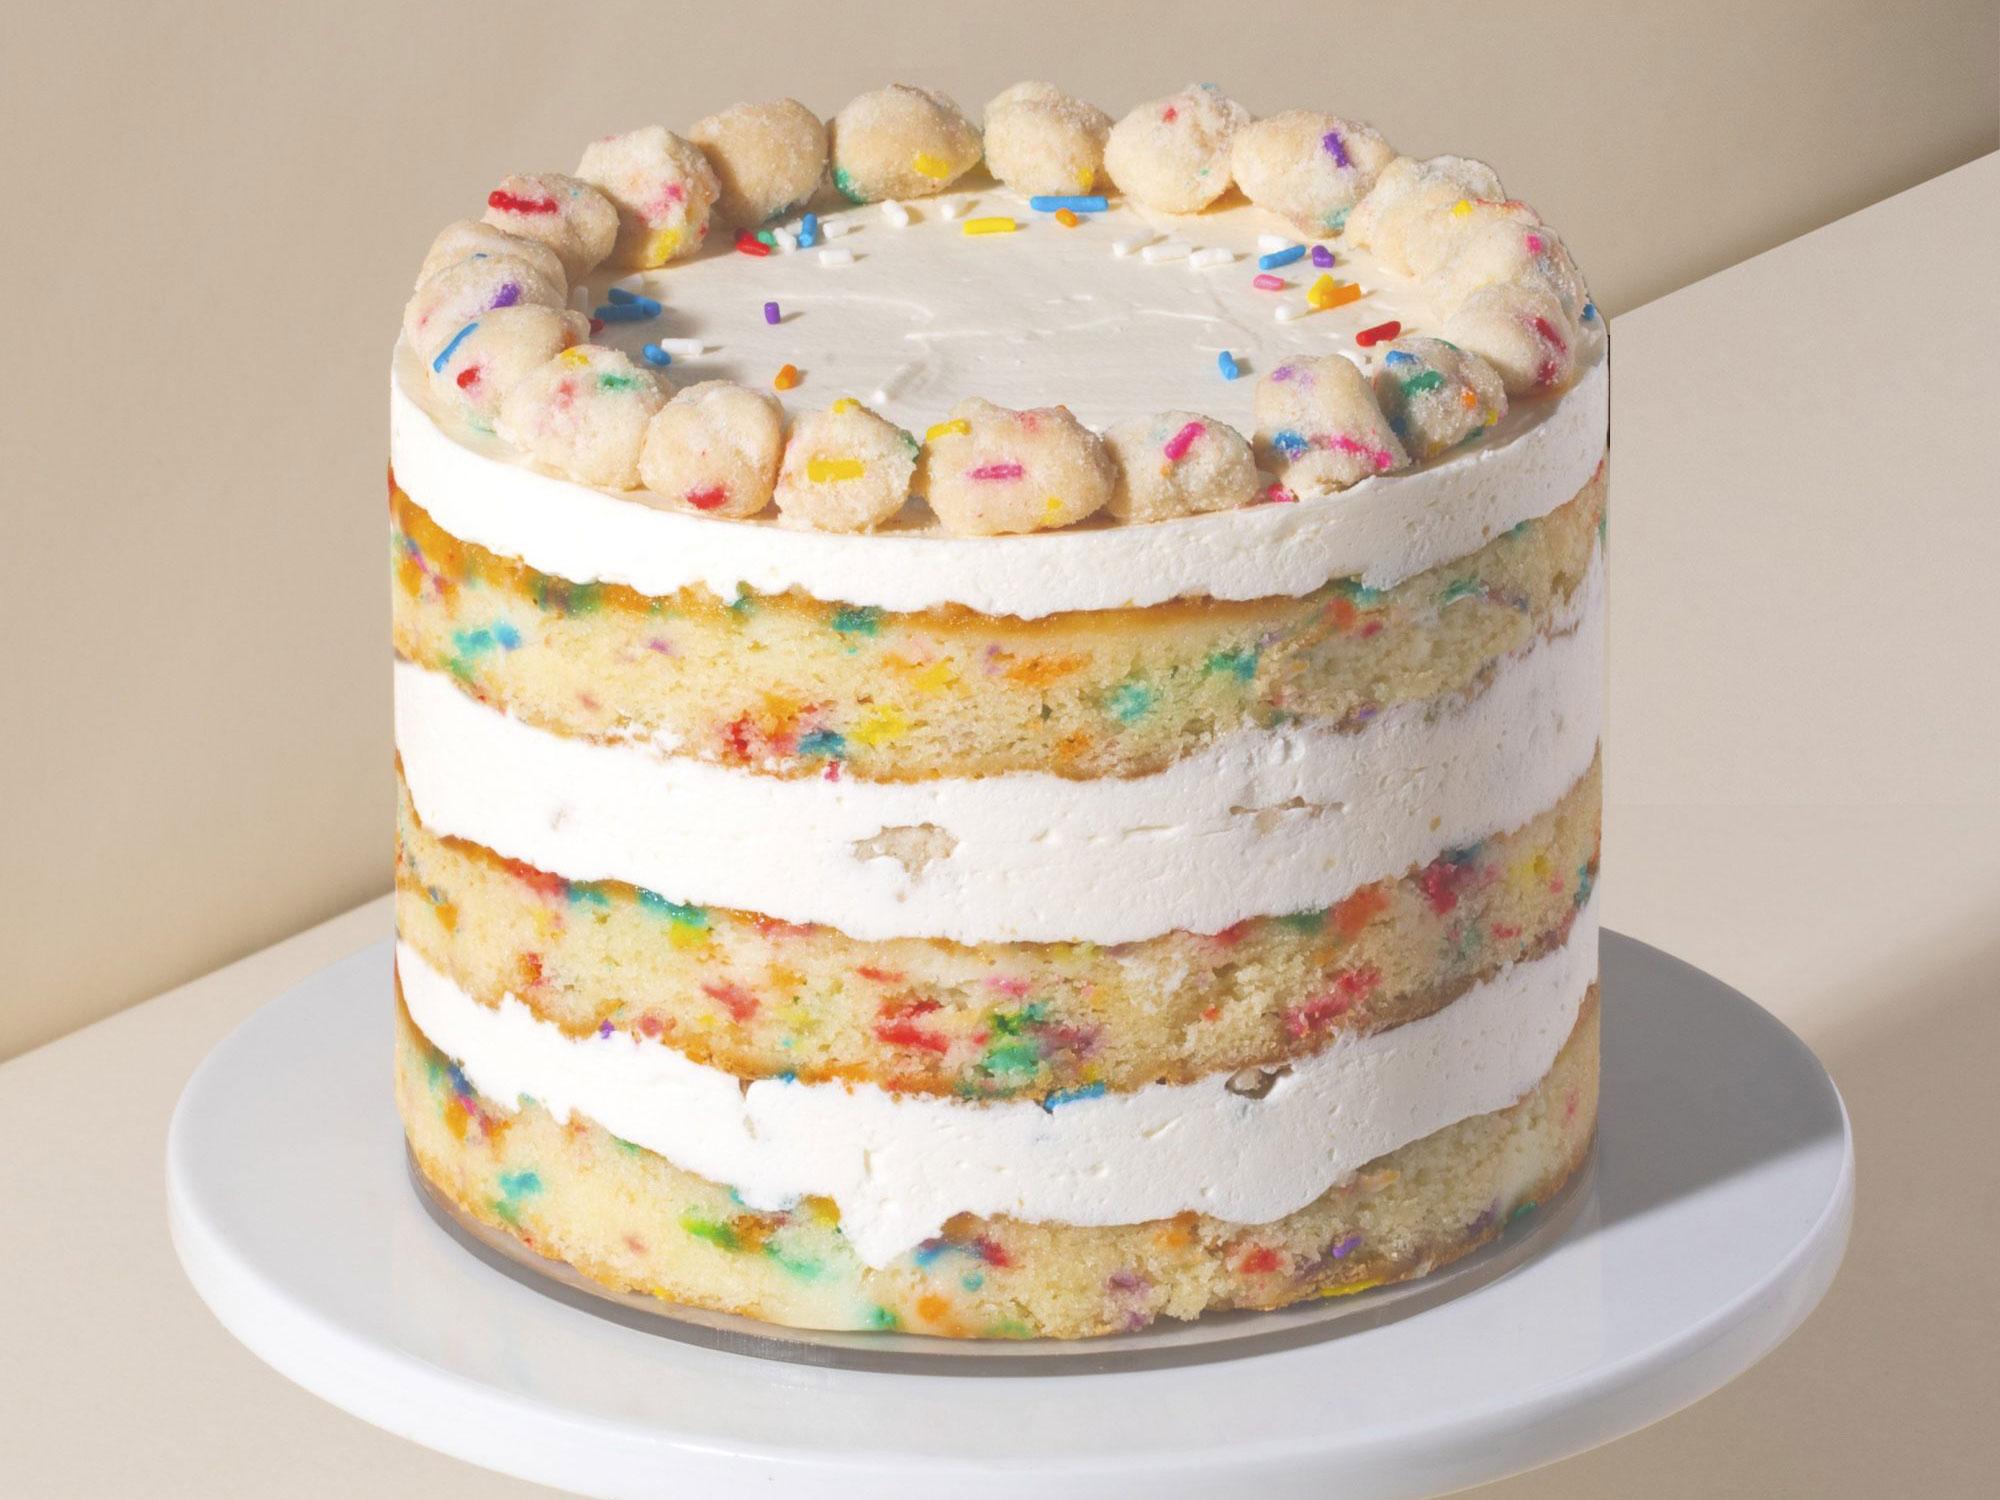 Birthday Cake Delivery: Milk Bar